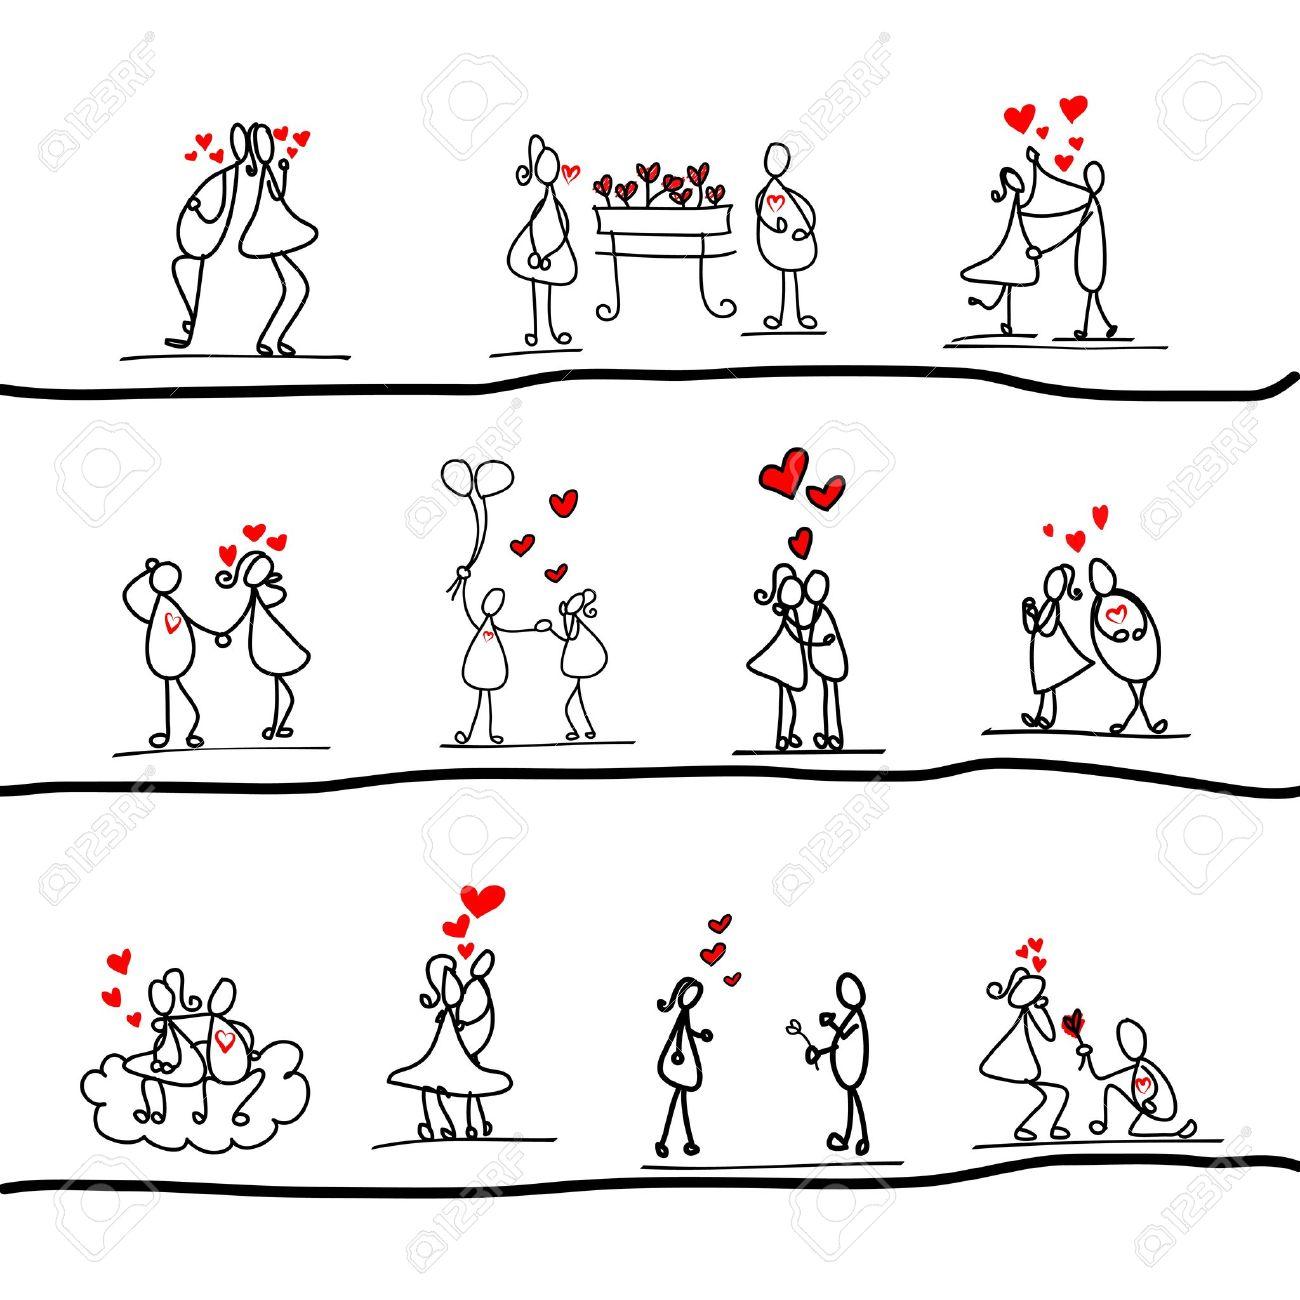 cartoon hand-drawn love character - 17875844